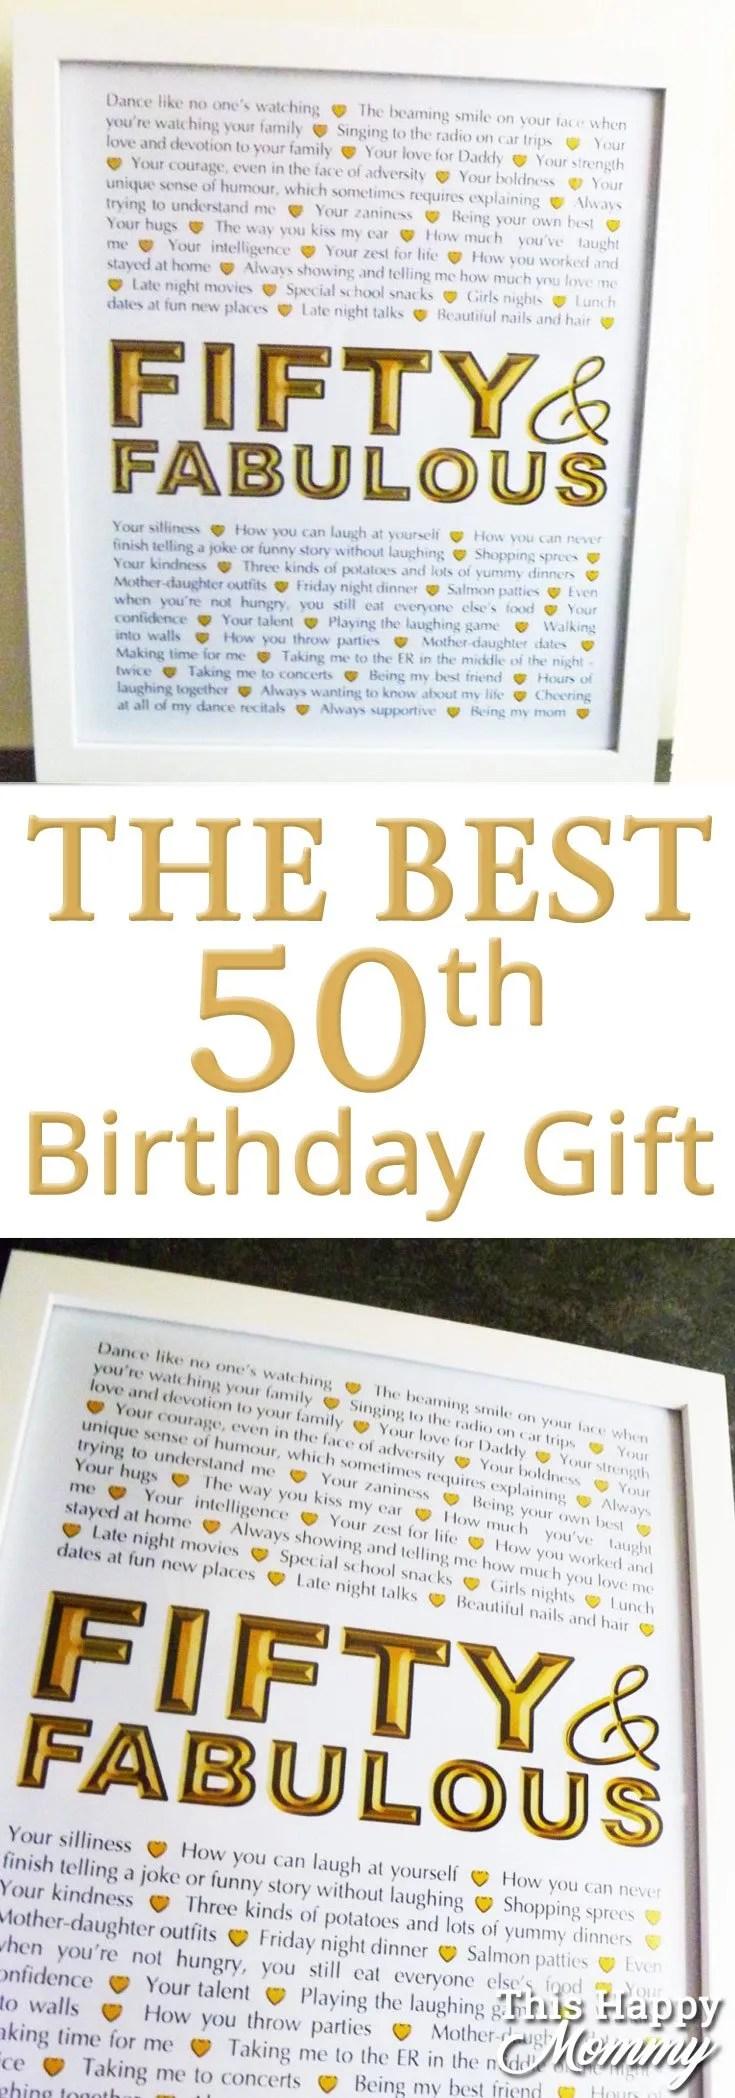 Milestone Birthday Gifts